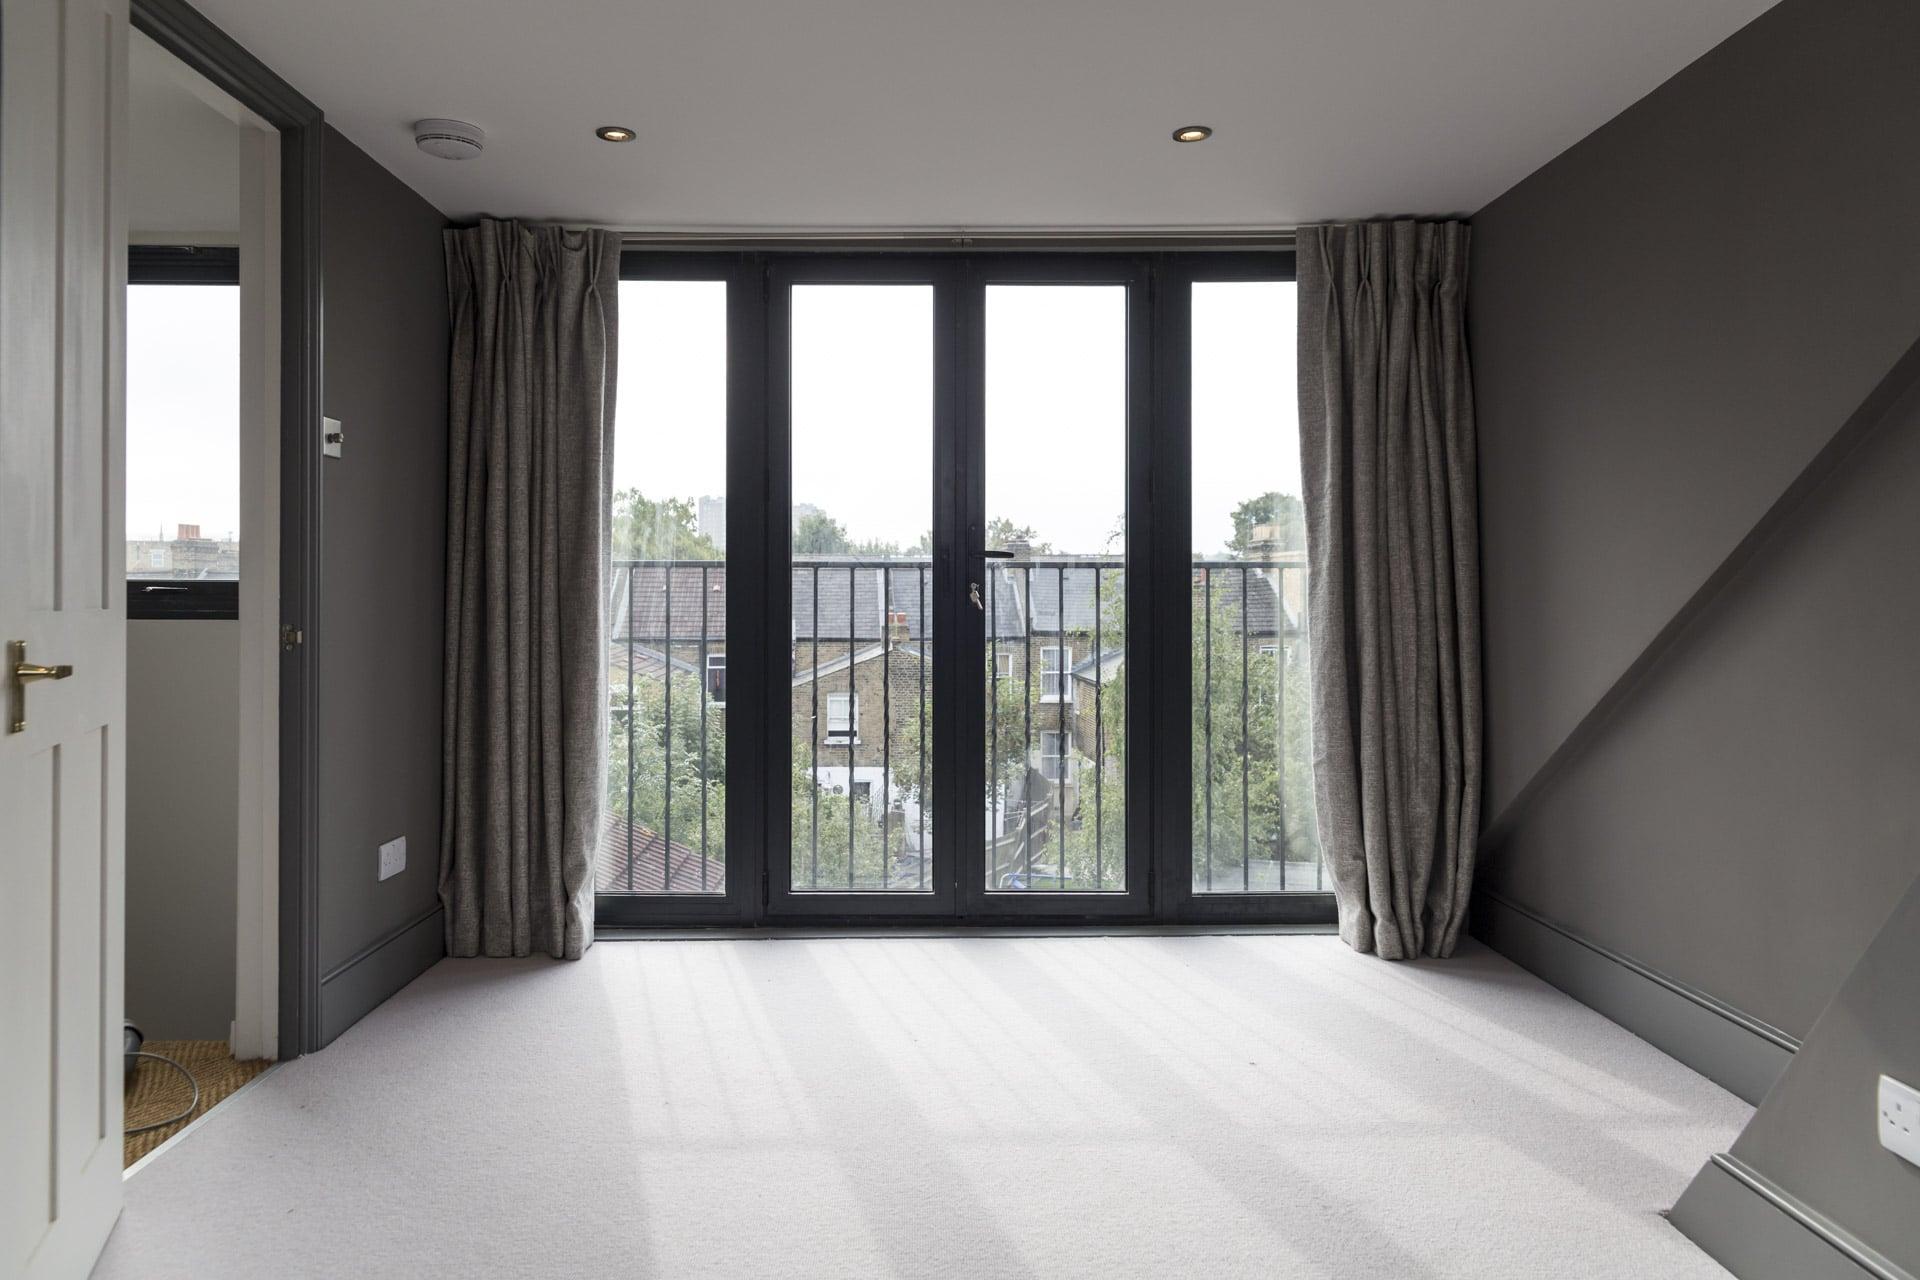 attic style bedroom ideas - Dormer Loft Conversion Ideas